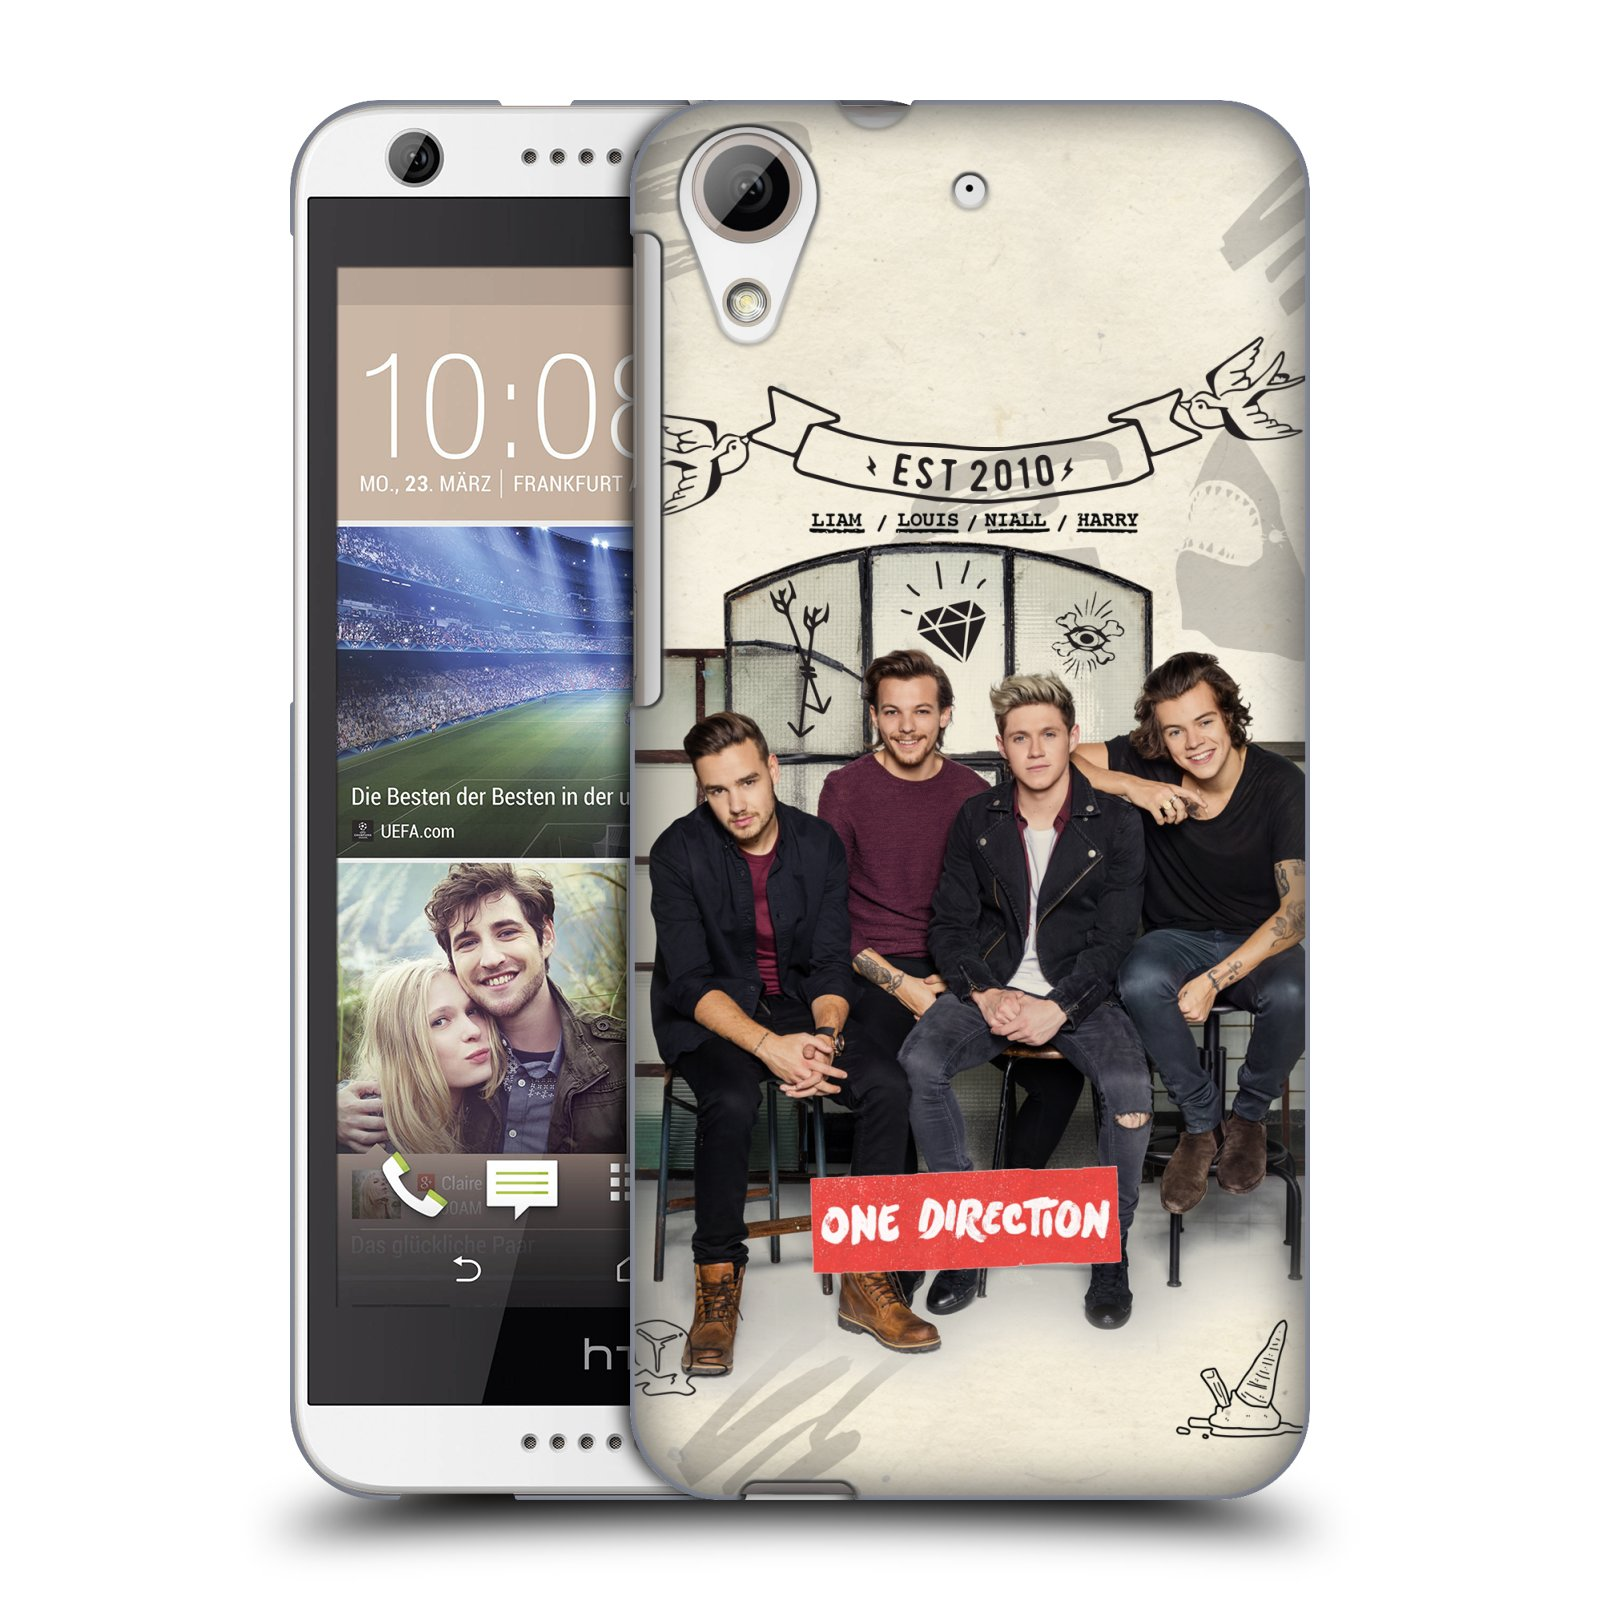 Plastové pouzdro na mobil HTC Desire 626 / 626G HEAD CASE One Direction - EST 2010 (Kryt či obal One Direction Official na mobilní telefon HTC Desire 626G Dual SIM a HTC Desire 626)